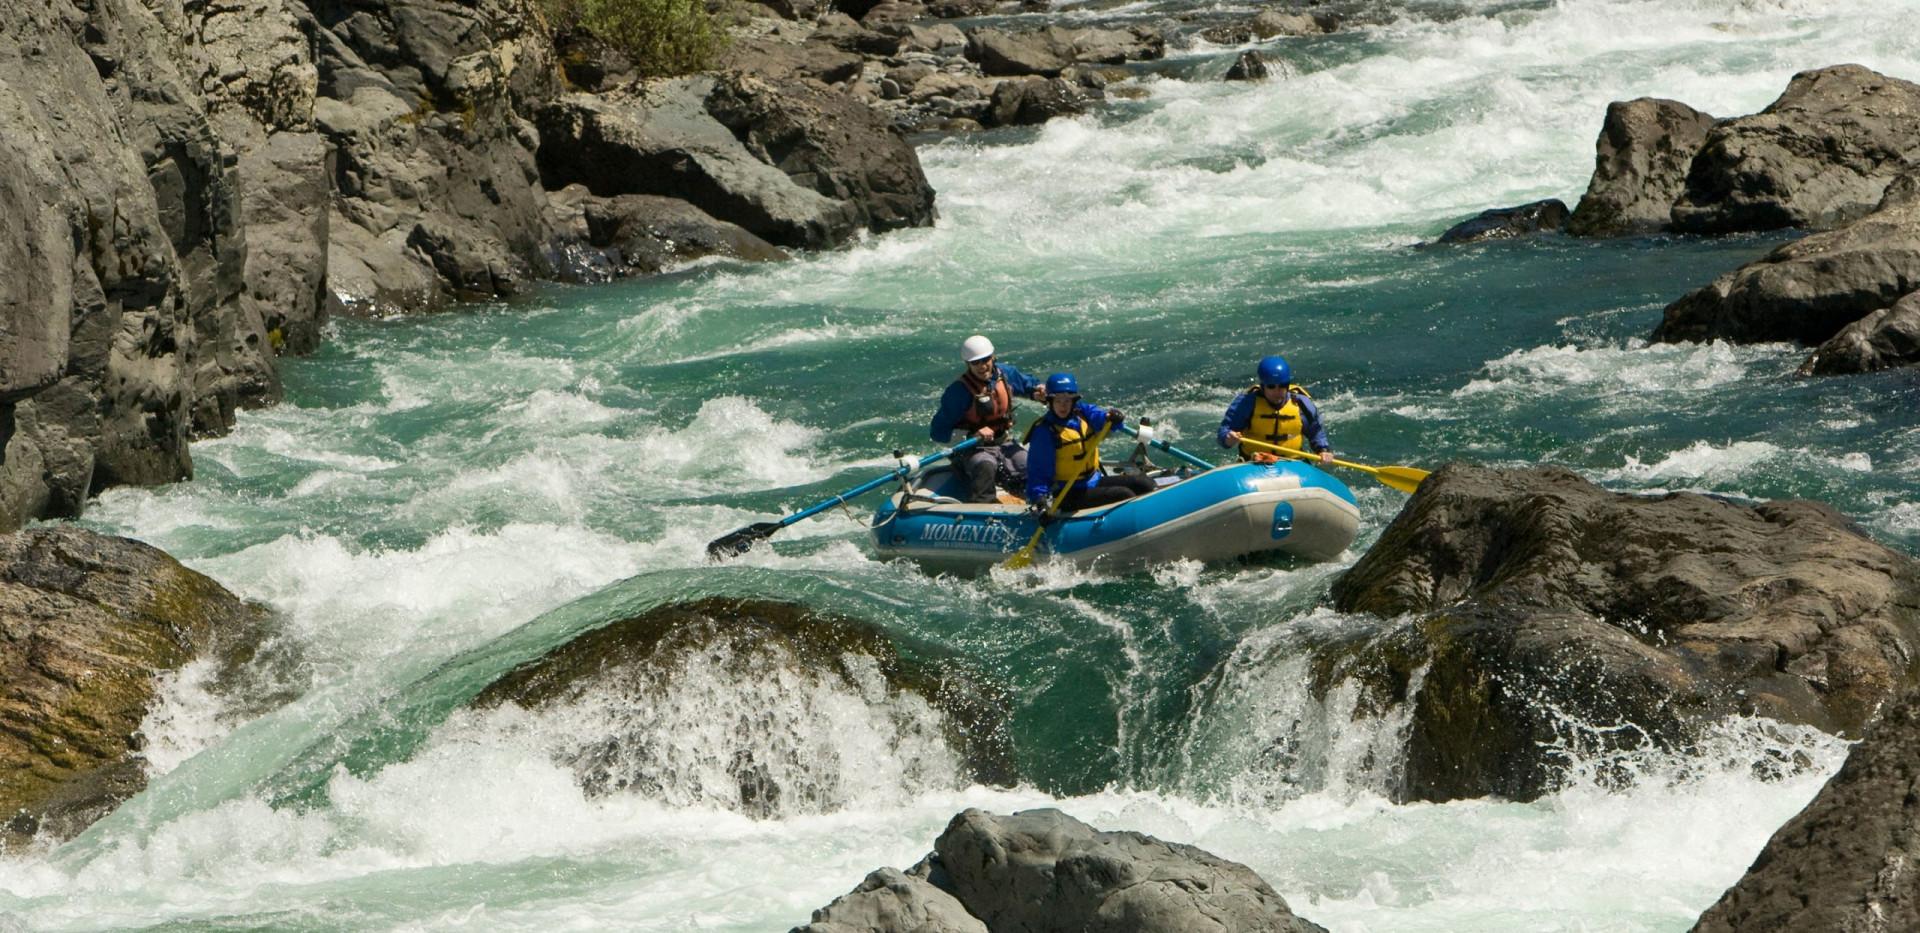 Green Wall Rapid - Illinois River Rafting - Oregon